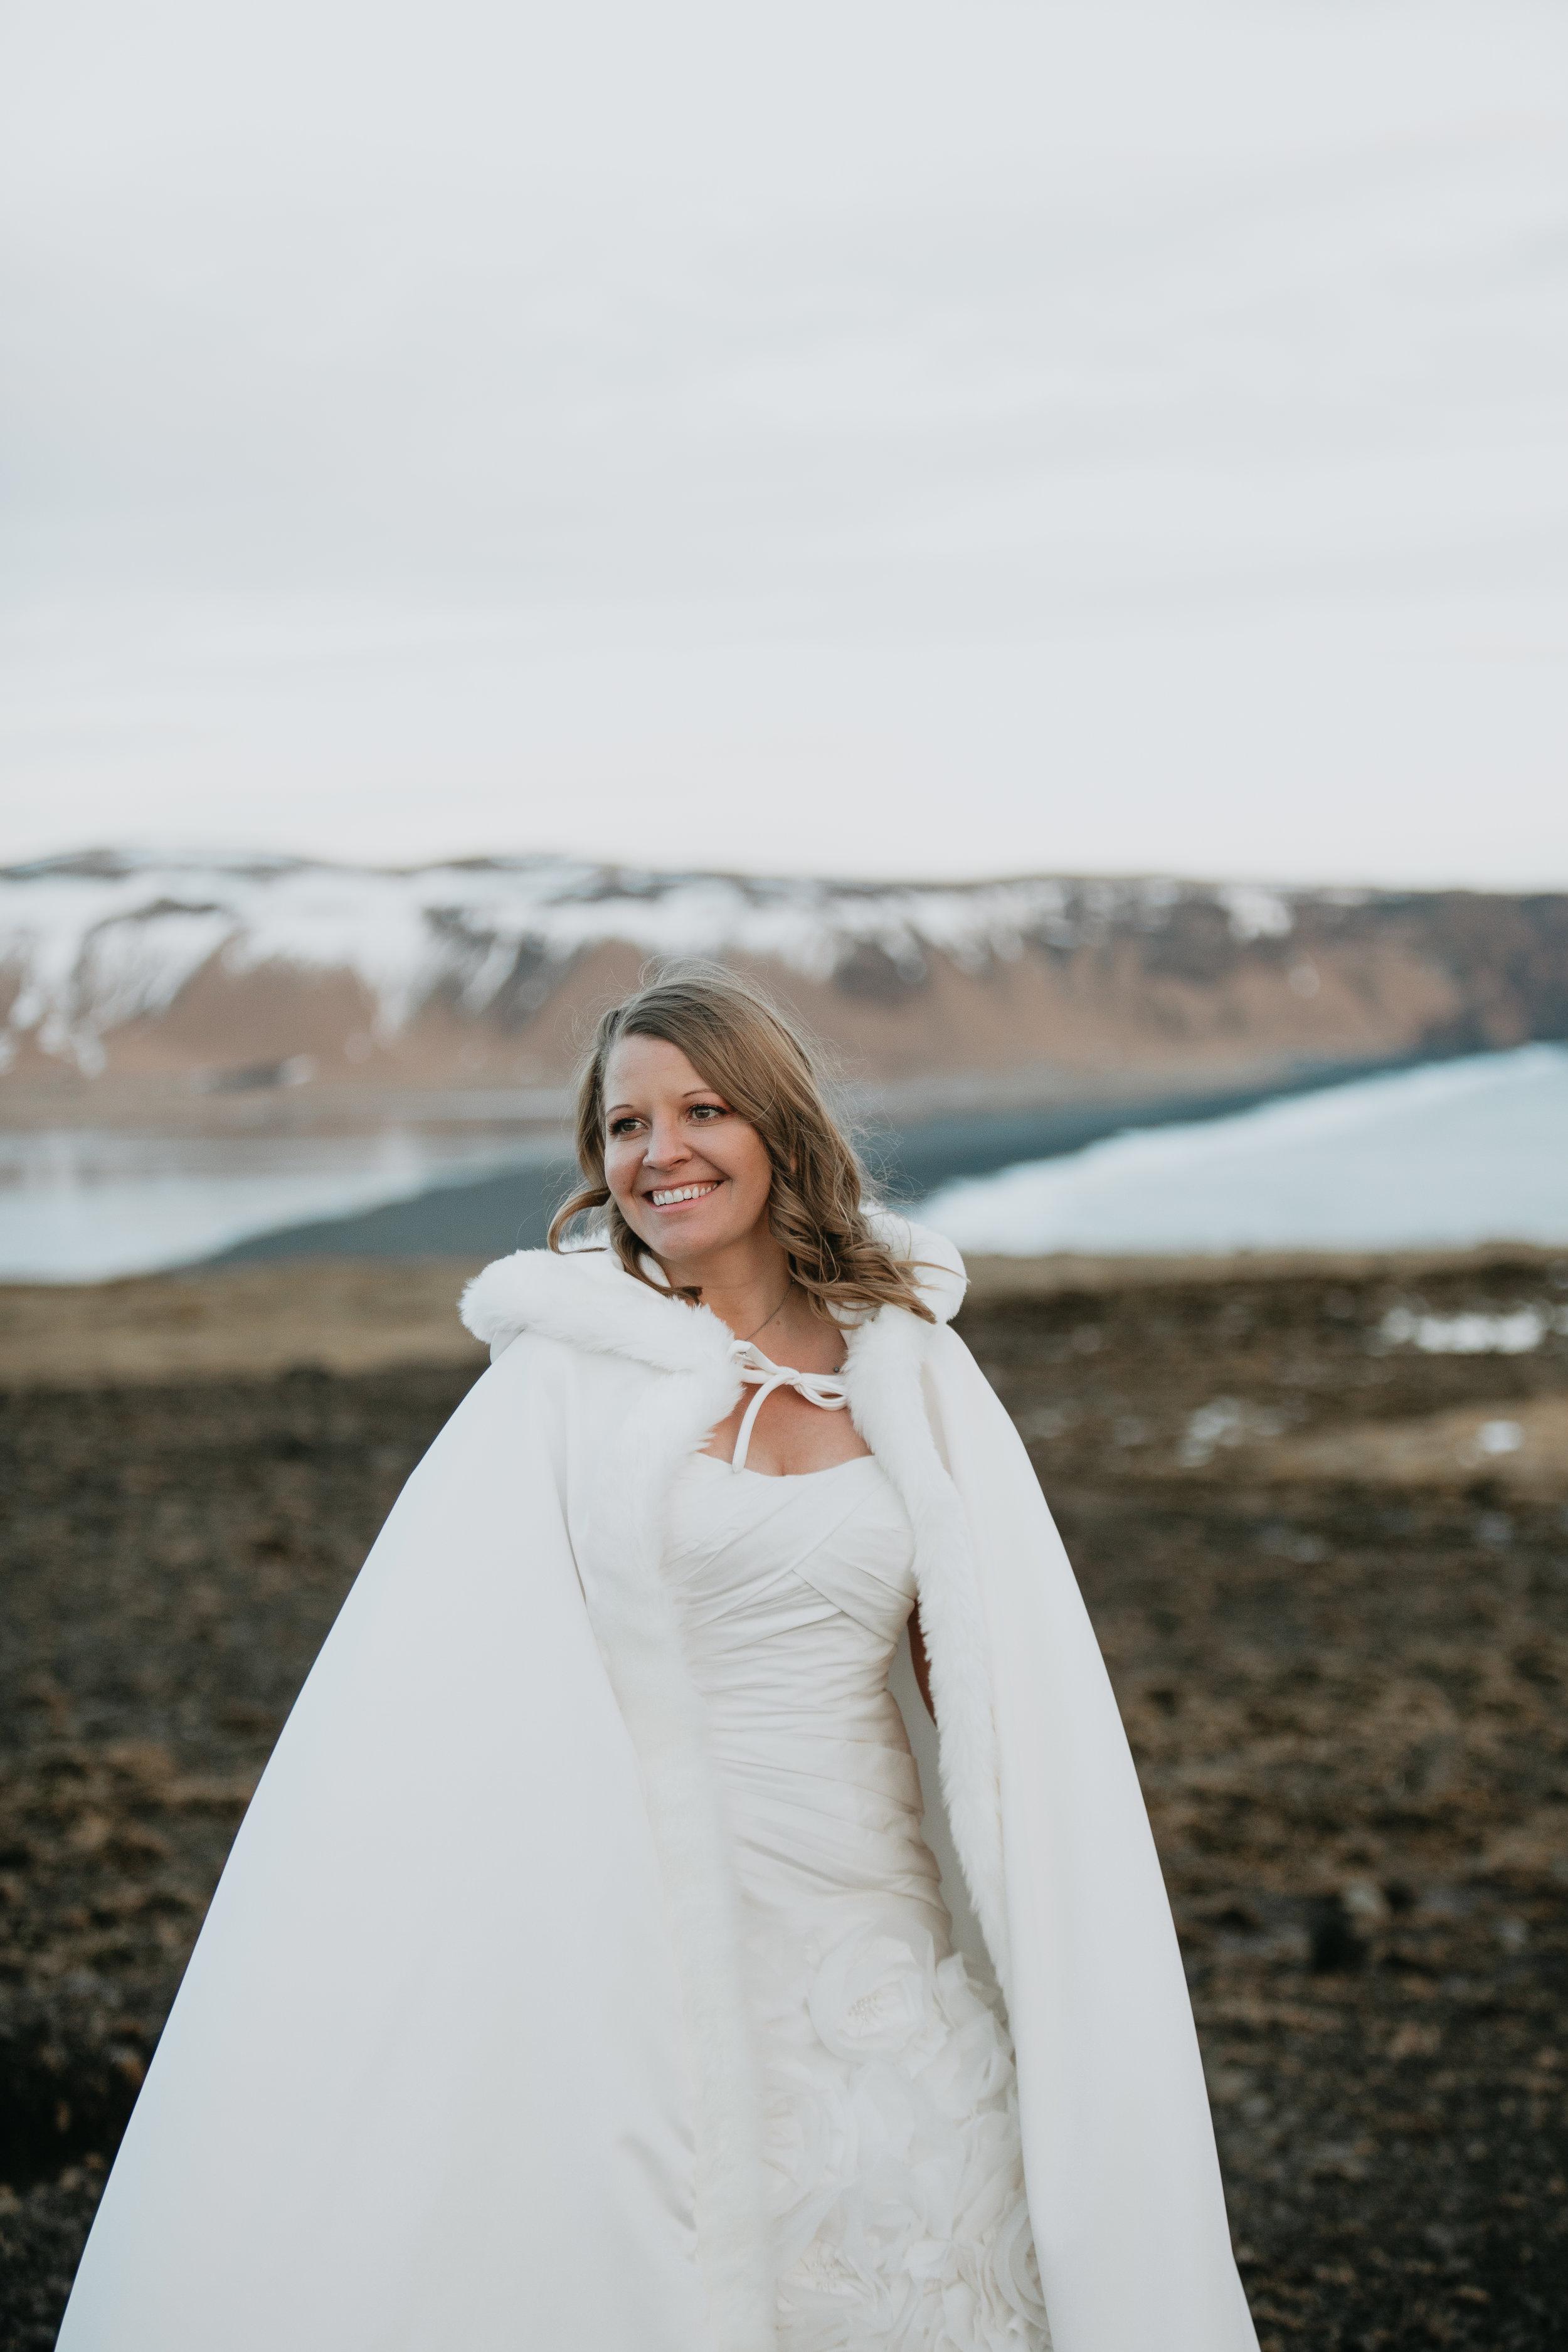 nicole-daacke-photography-iceland-winter-sunset-adventure-elopement-skogafoss-waterfall-black-sand-beach-dyrholaey-vik-iceland-intimate-wedding-black-church-elopement-photographer-33.jpg